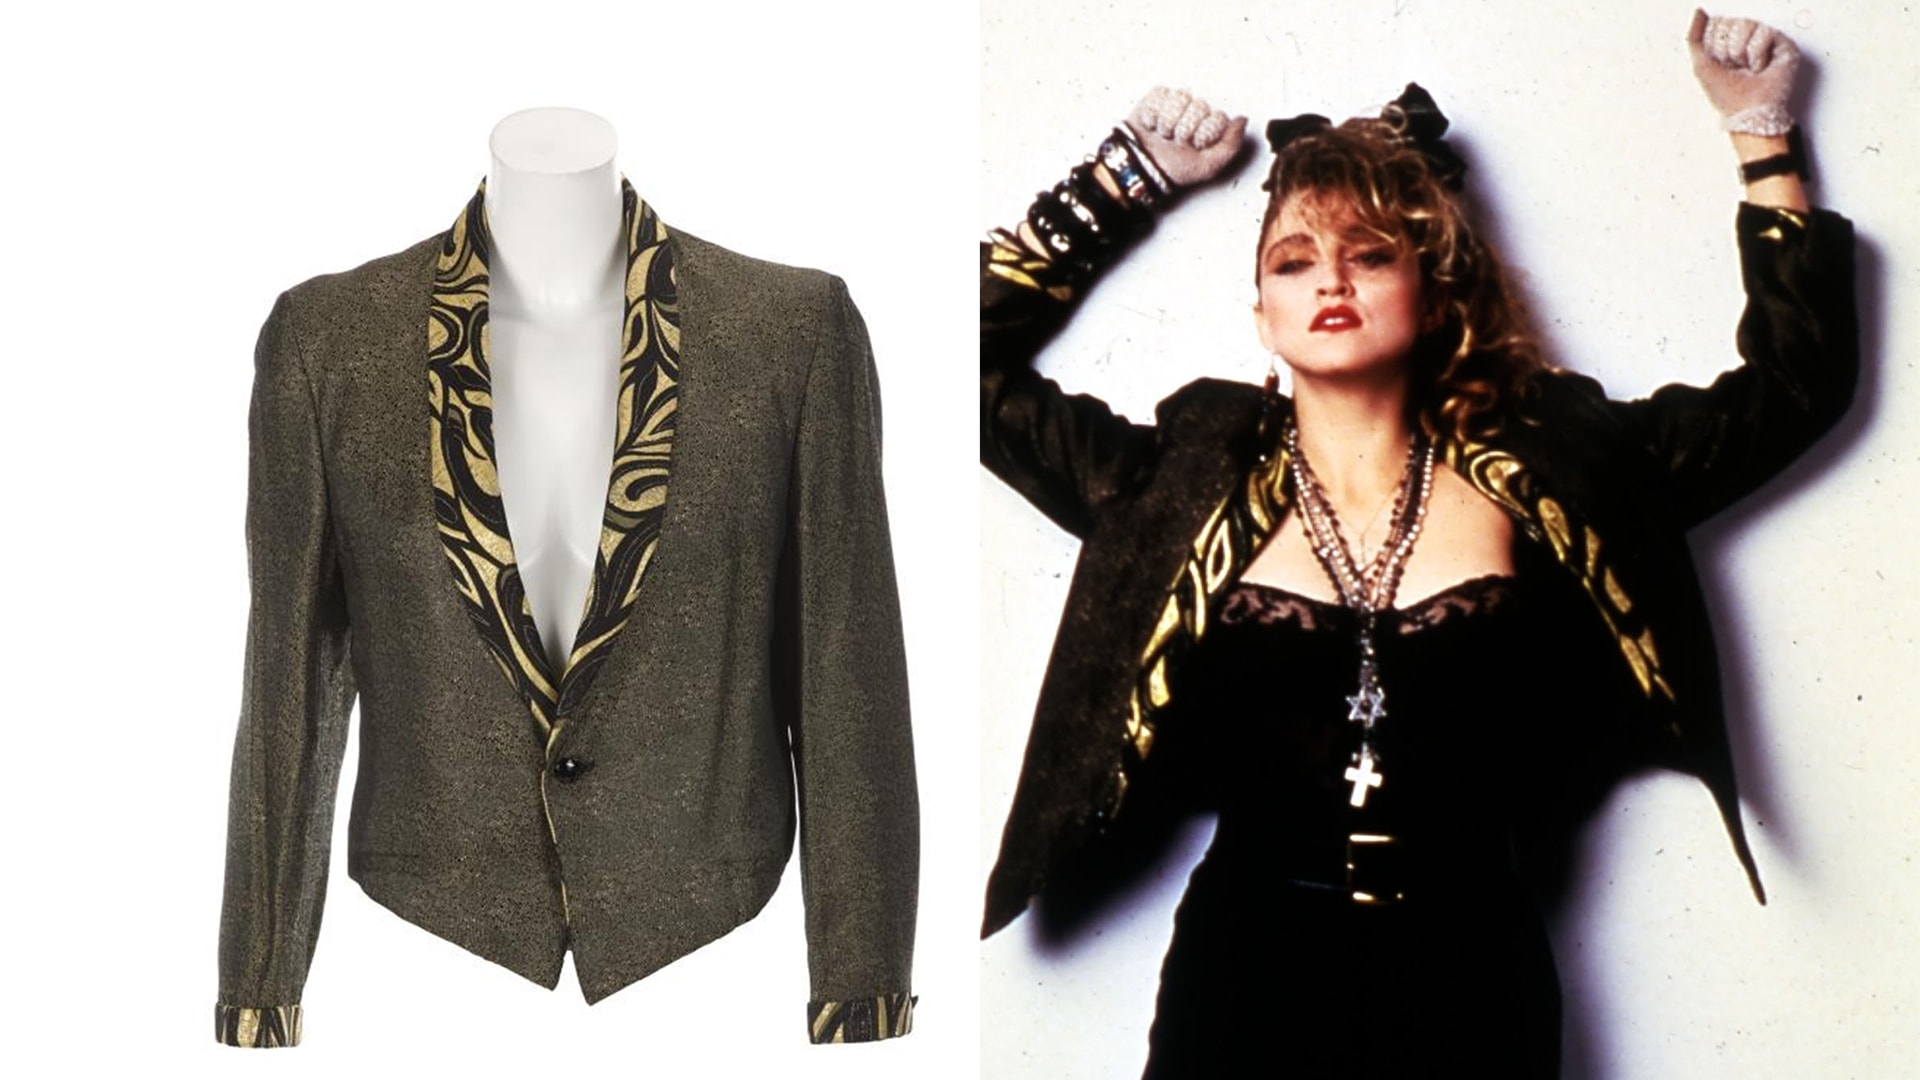 Madonna Clothes Memorabilia Go Up For Auction